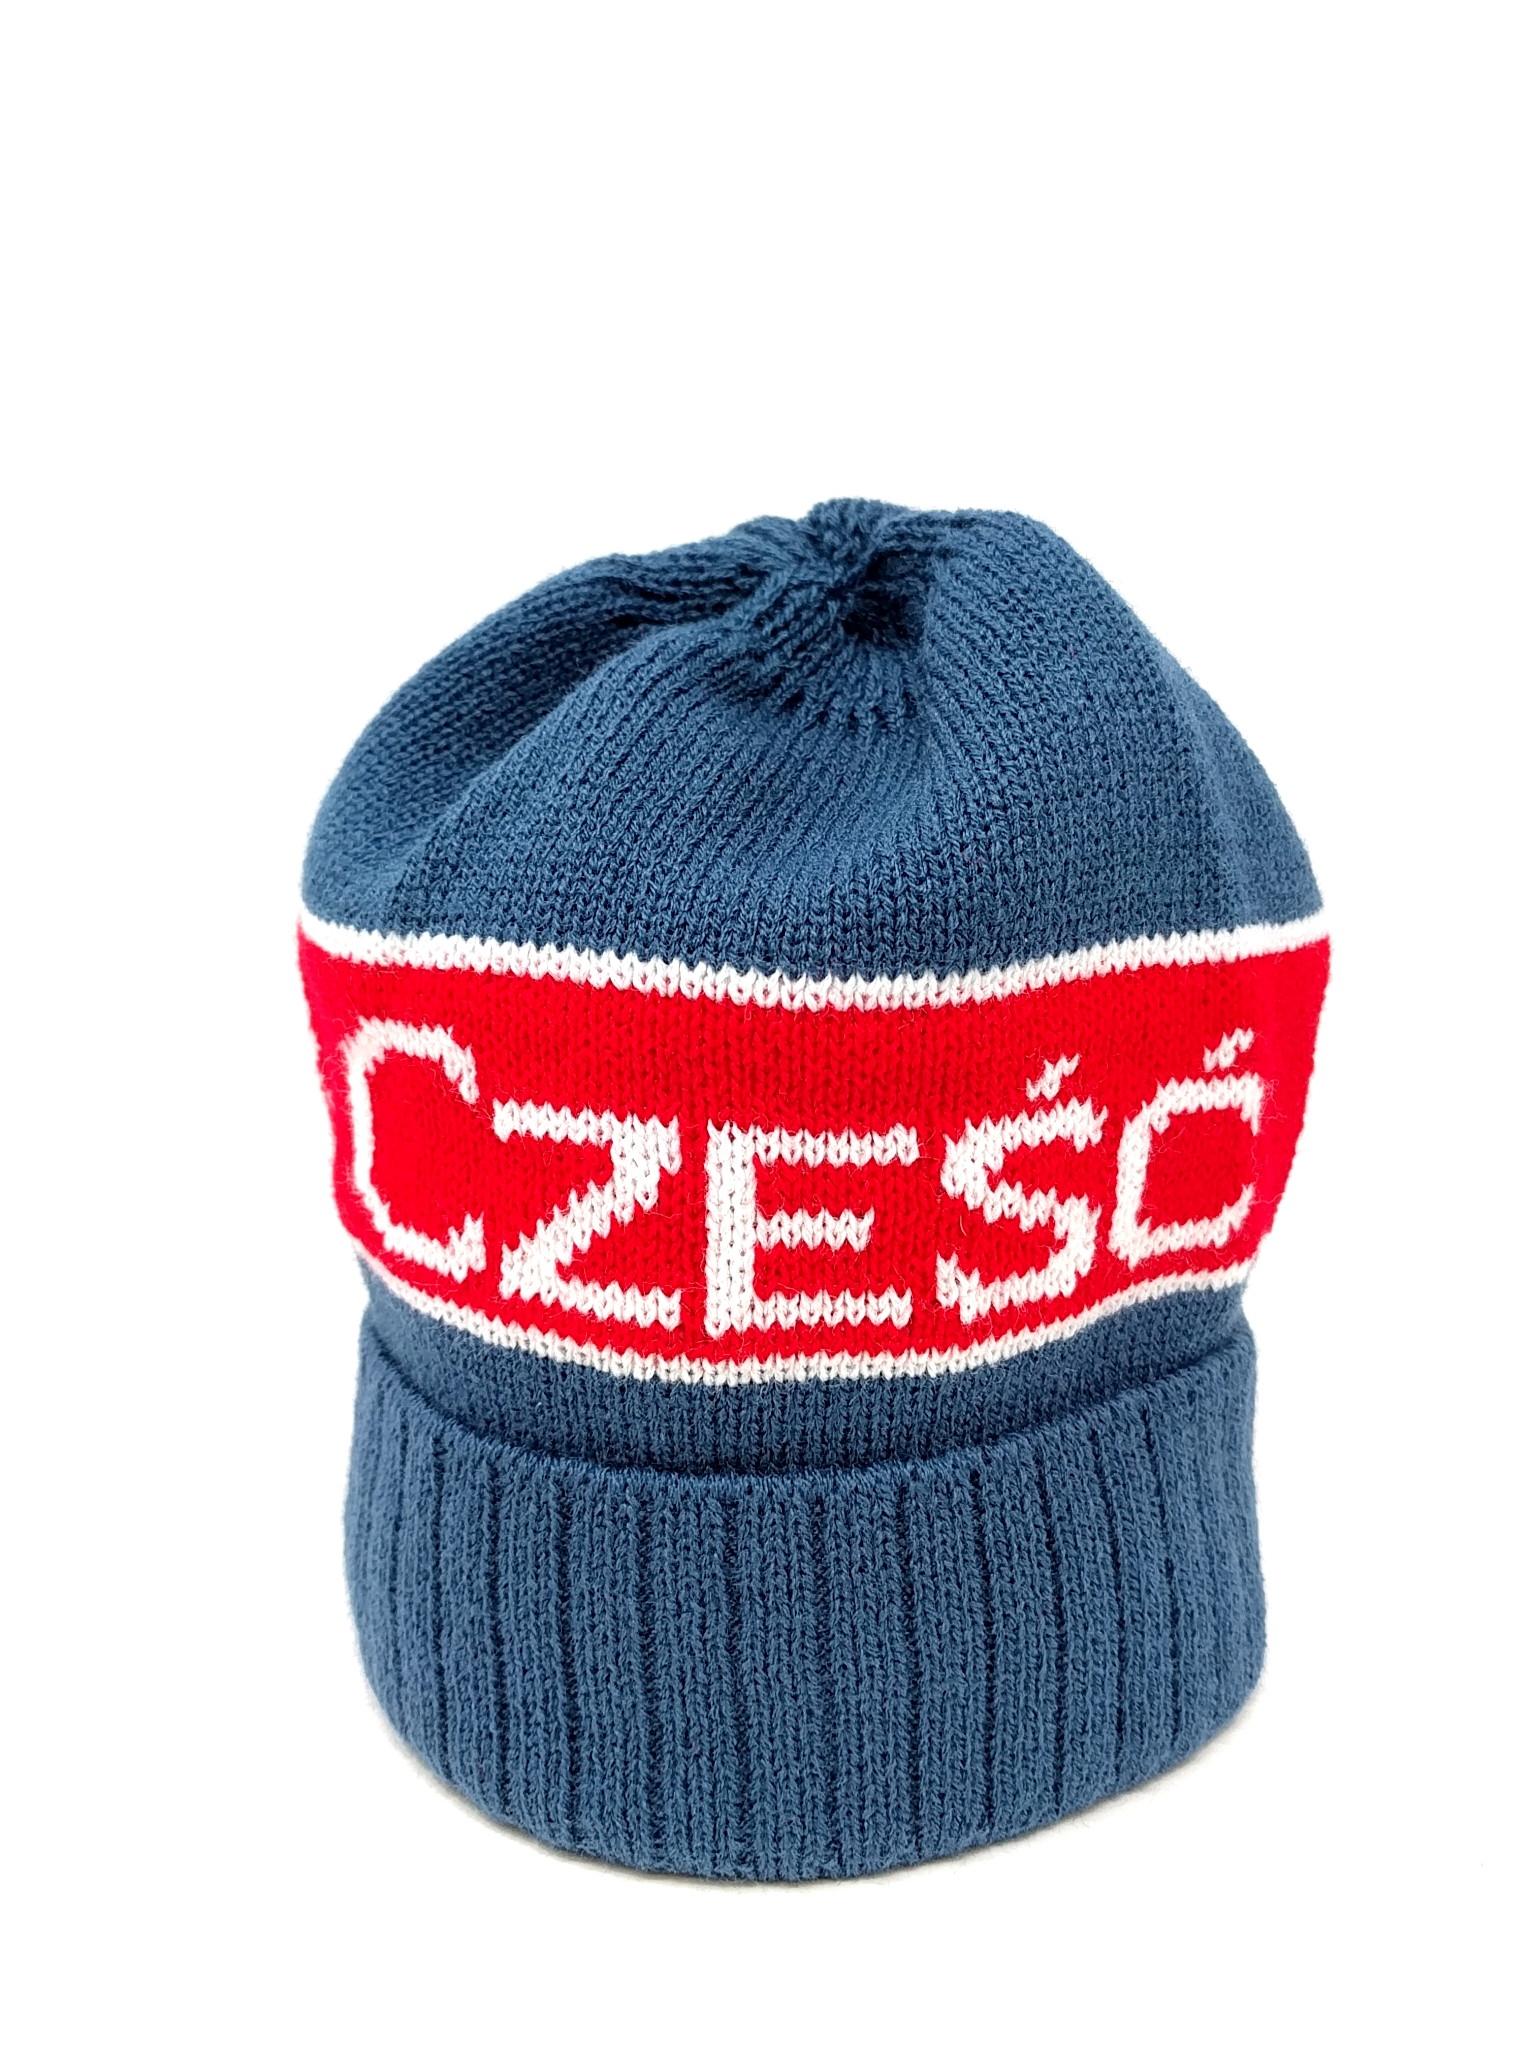 Blue Knit Hat Ornament